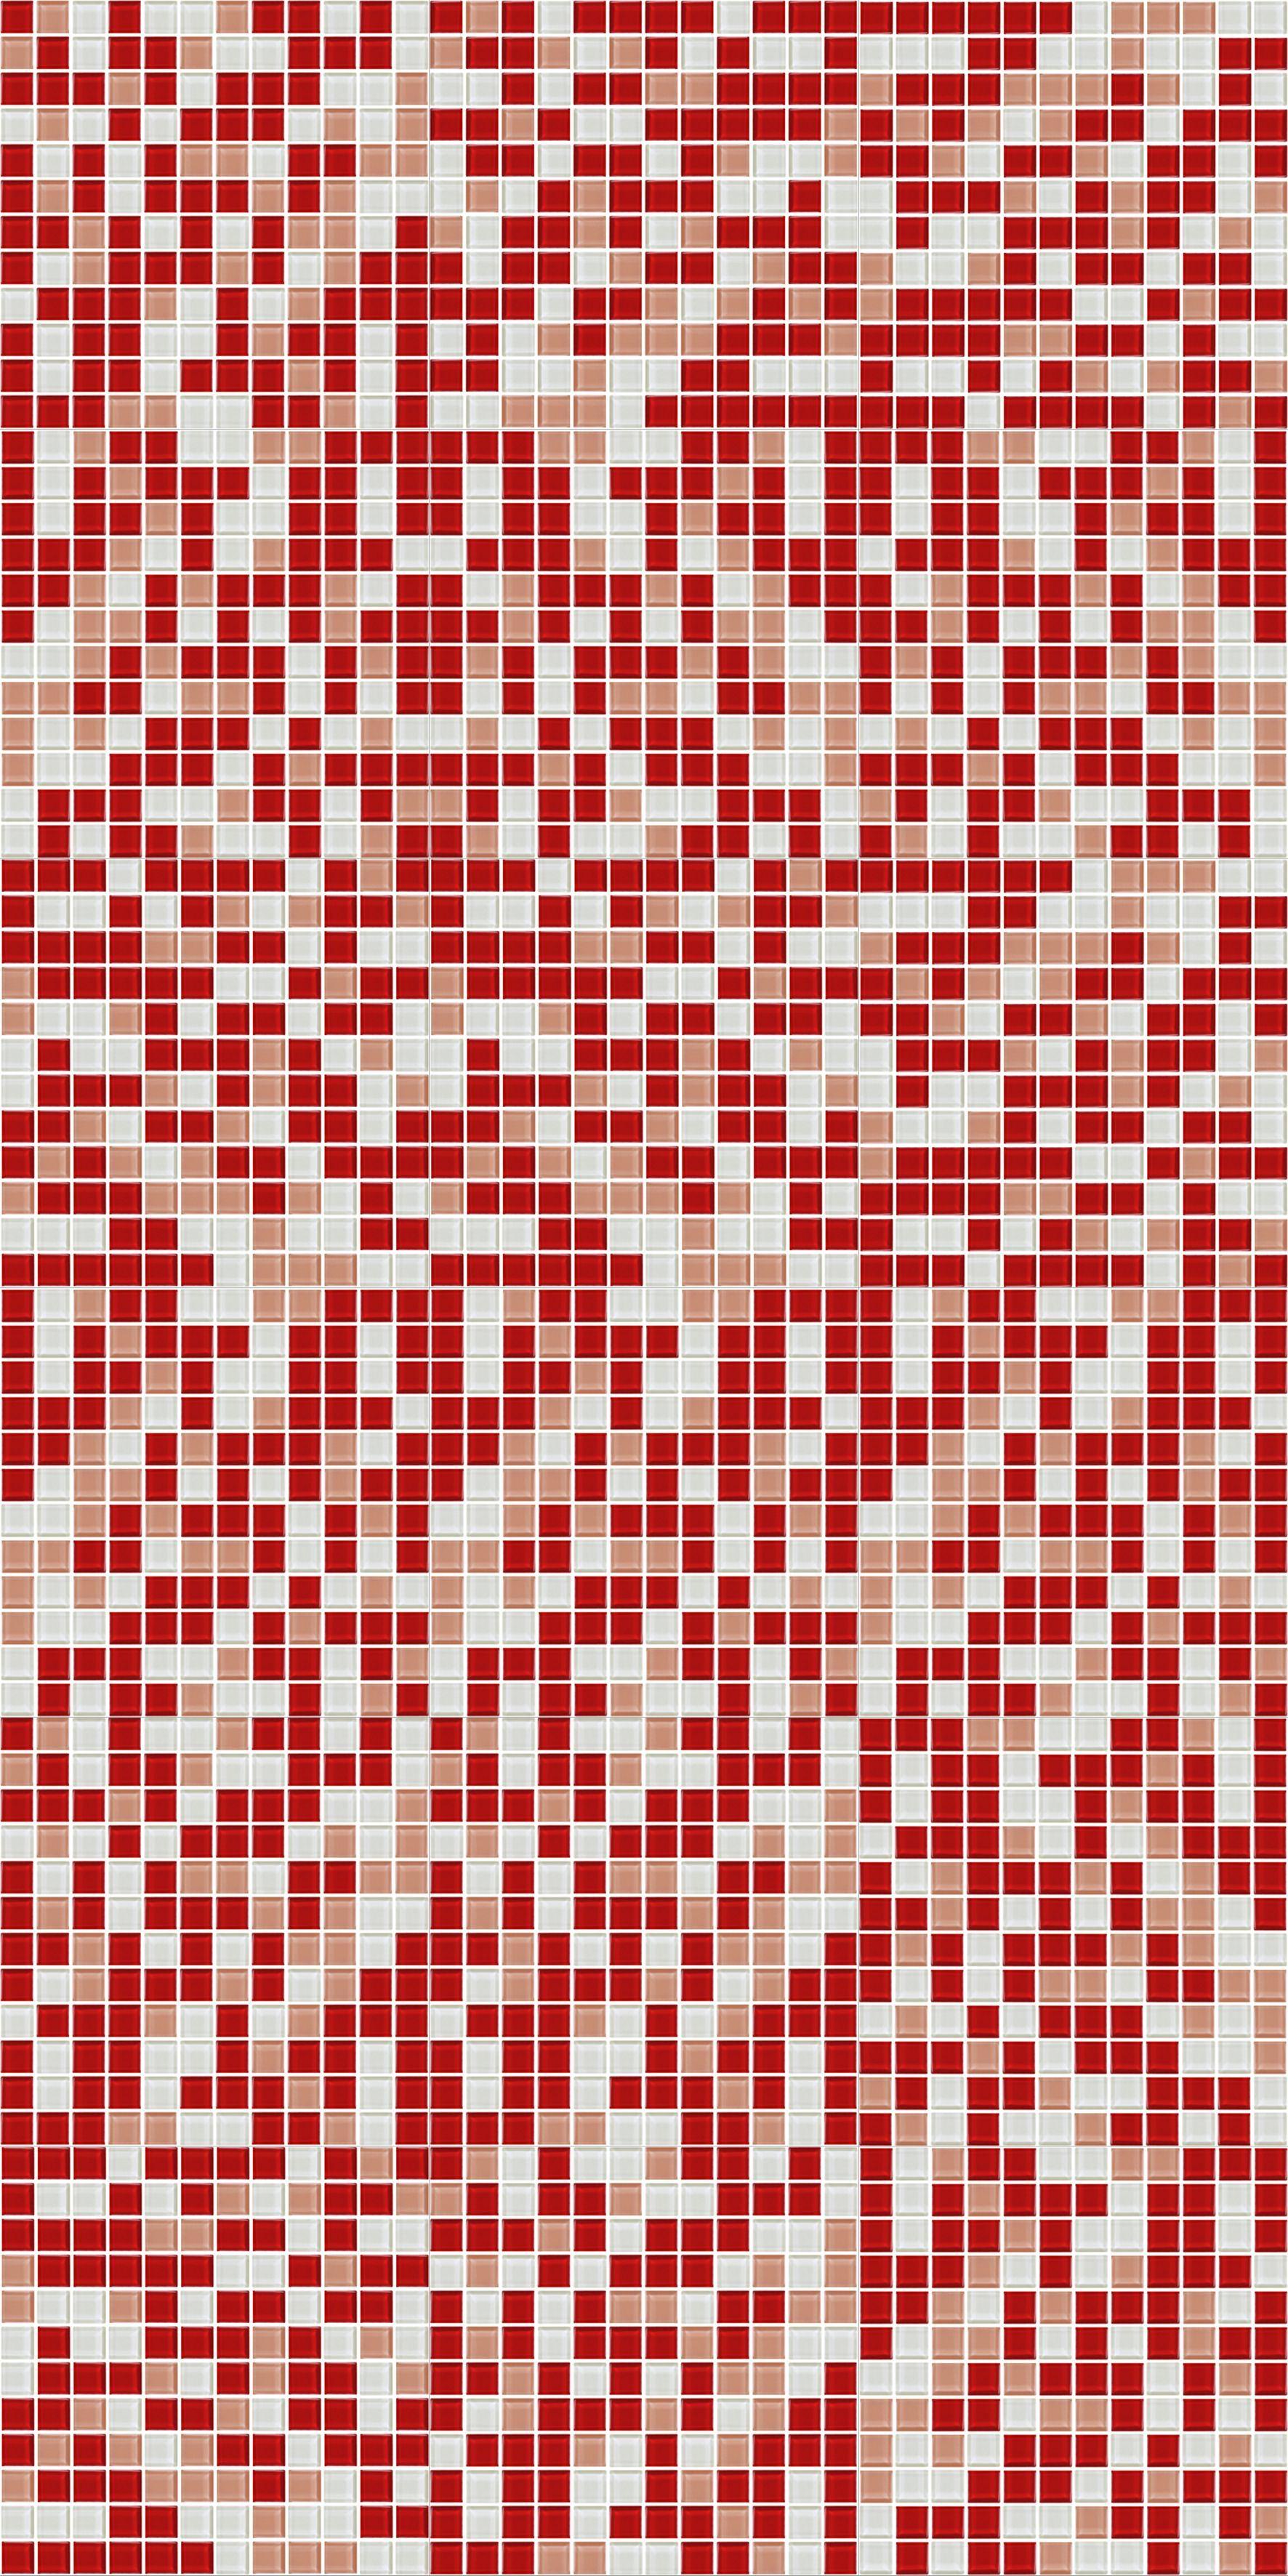 adesivo pastilha vermelha frete gratis adesivo adesivo pastilha  #A80808 1772x3544 Banheiro Com Pastilha Vermelho